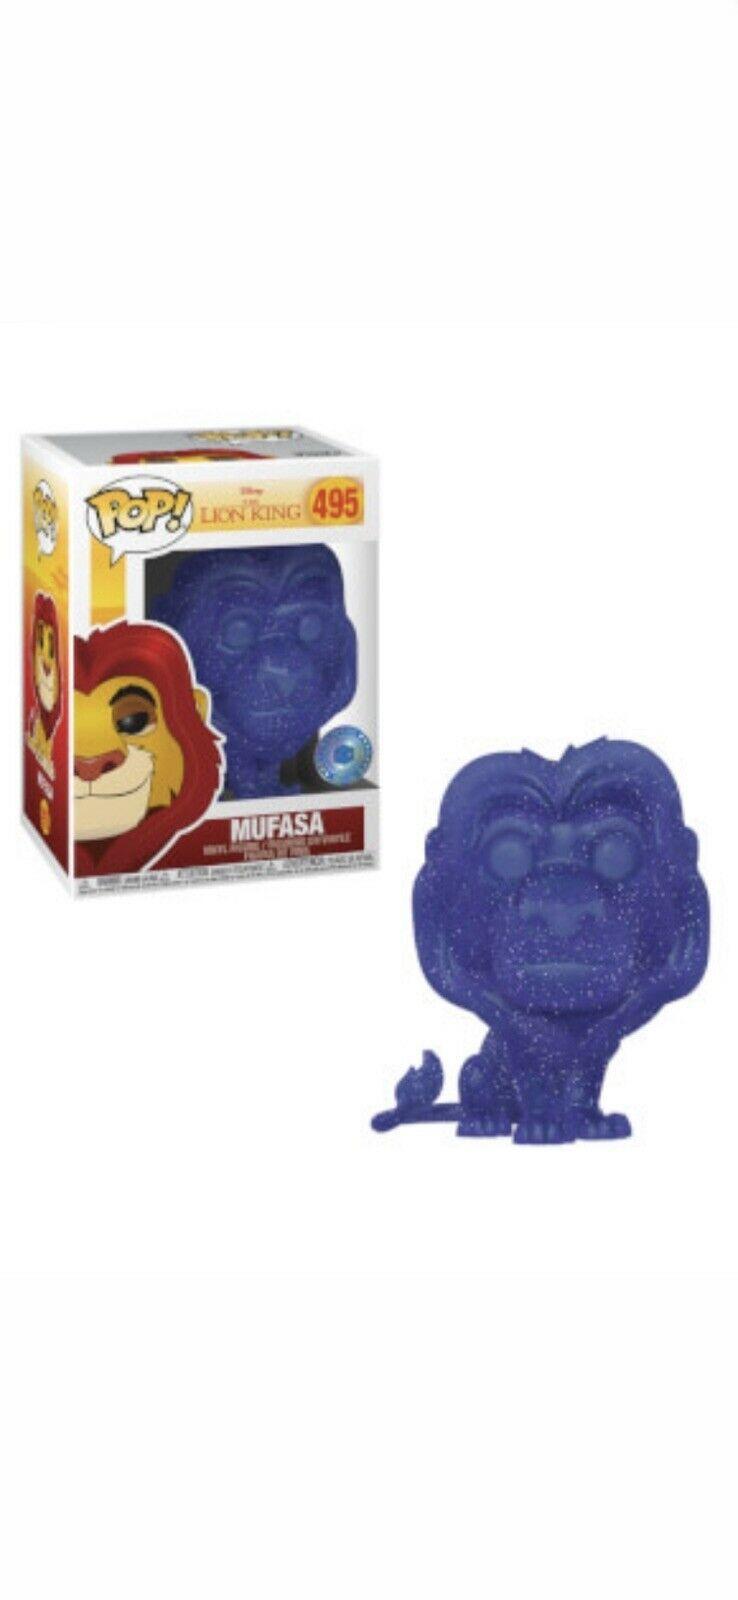 Funko Pop Lion King Mufasa Spirit Exclusivo Piab  - Game Land Brinquedos